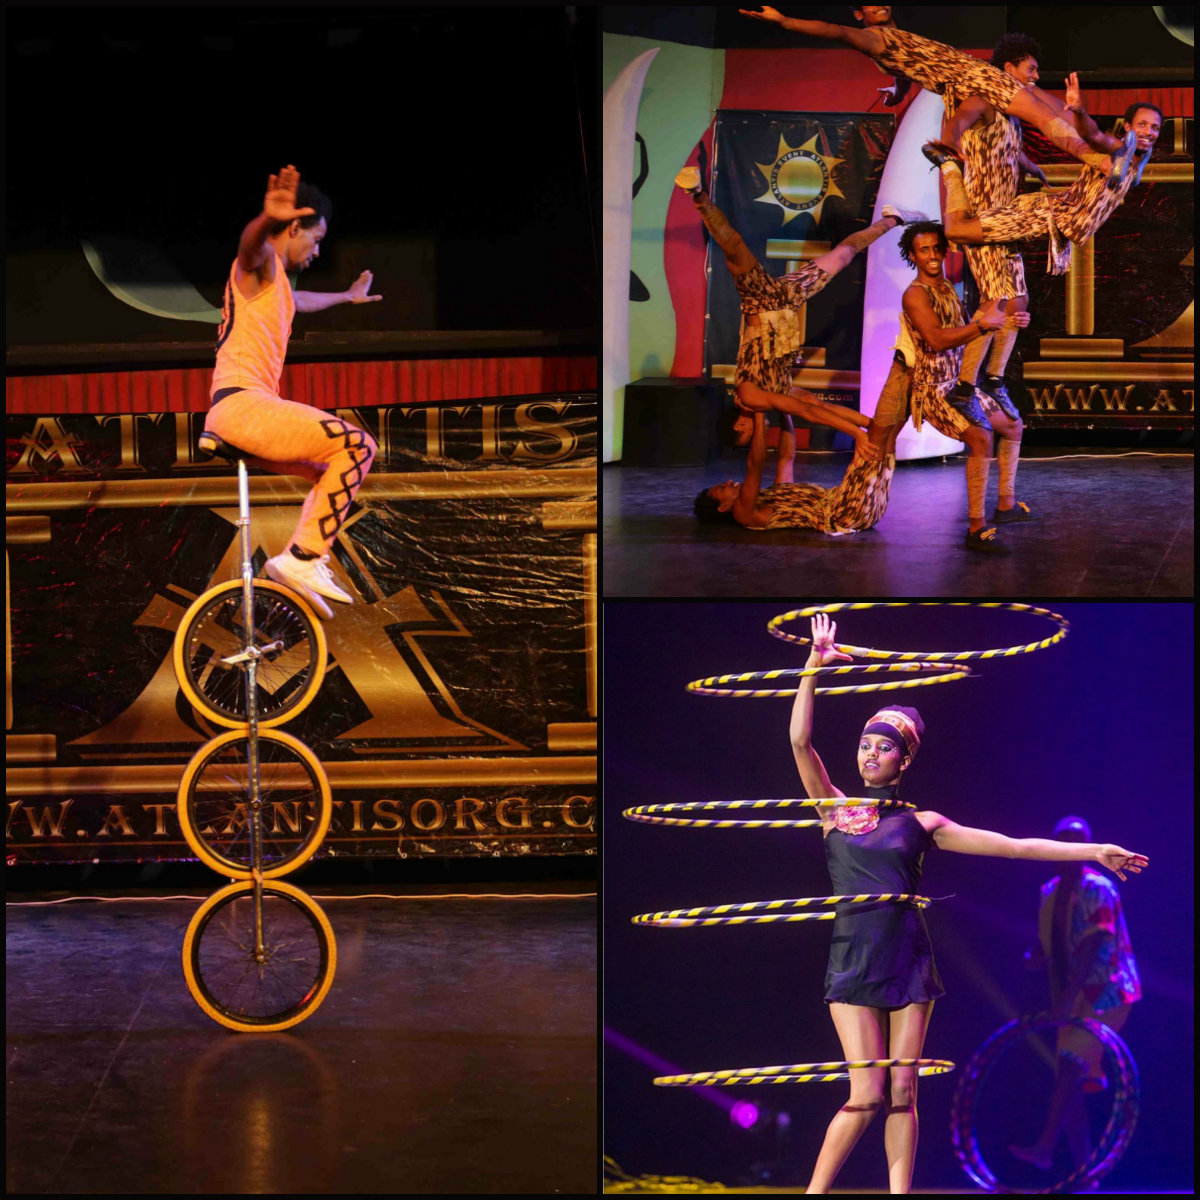 Цирки из Африки и Монголии в гостях у цирка «Браво» на Песах